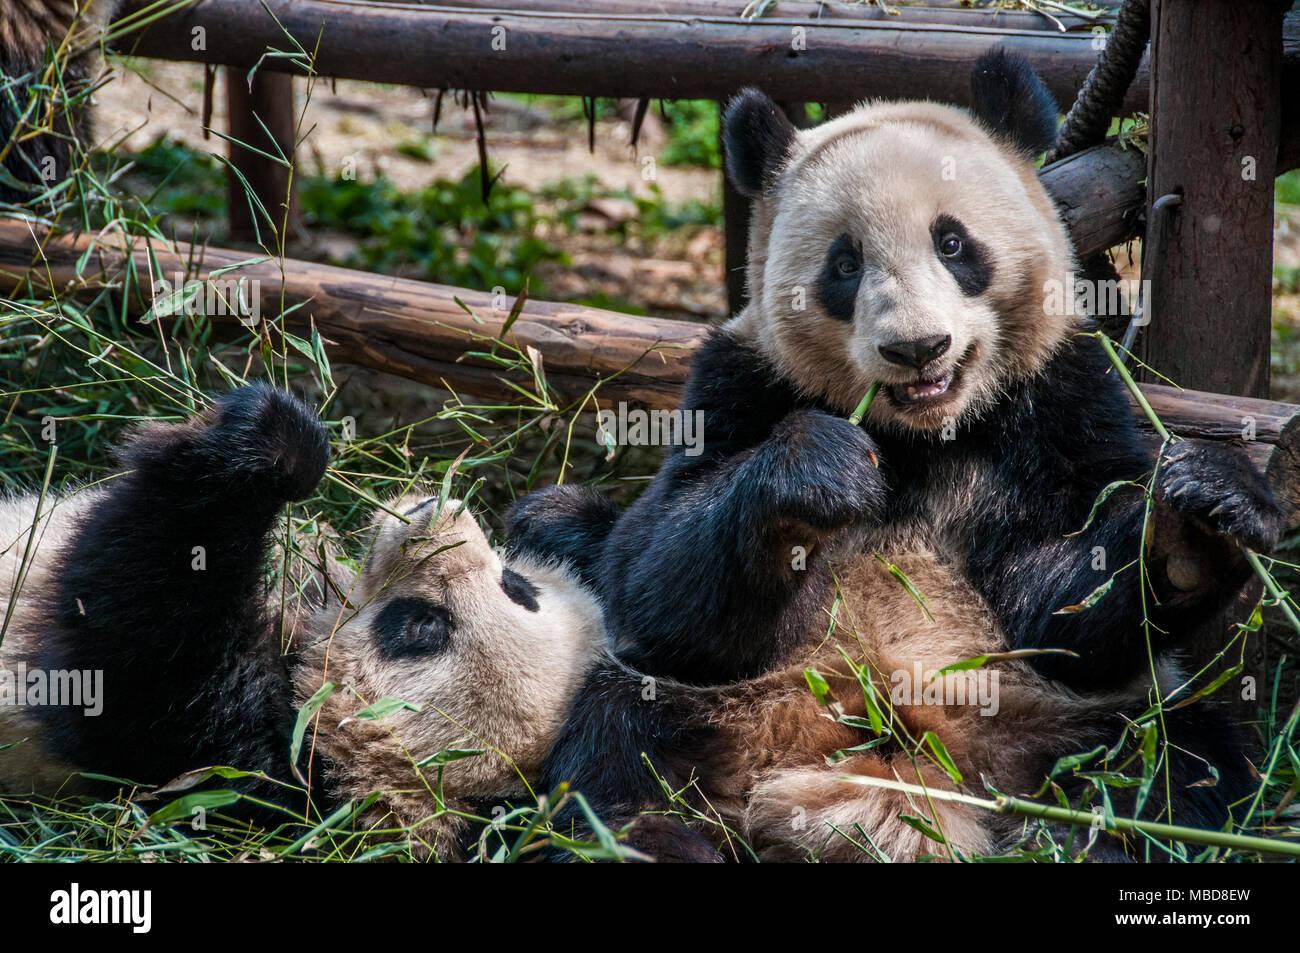 Un panda gigante en un alojamiento en Chengdu Base de investigación de pandas gigantes en China cría Imagen De Stock